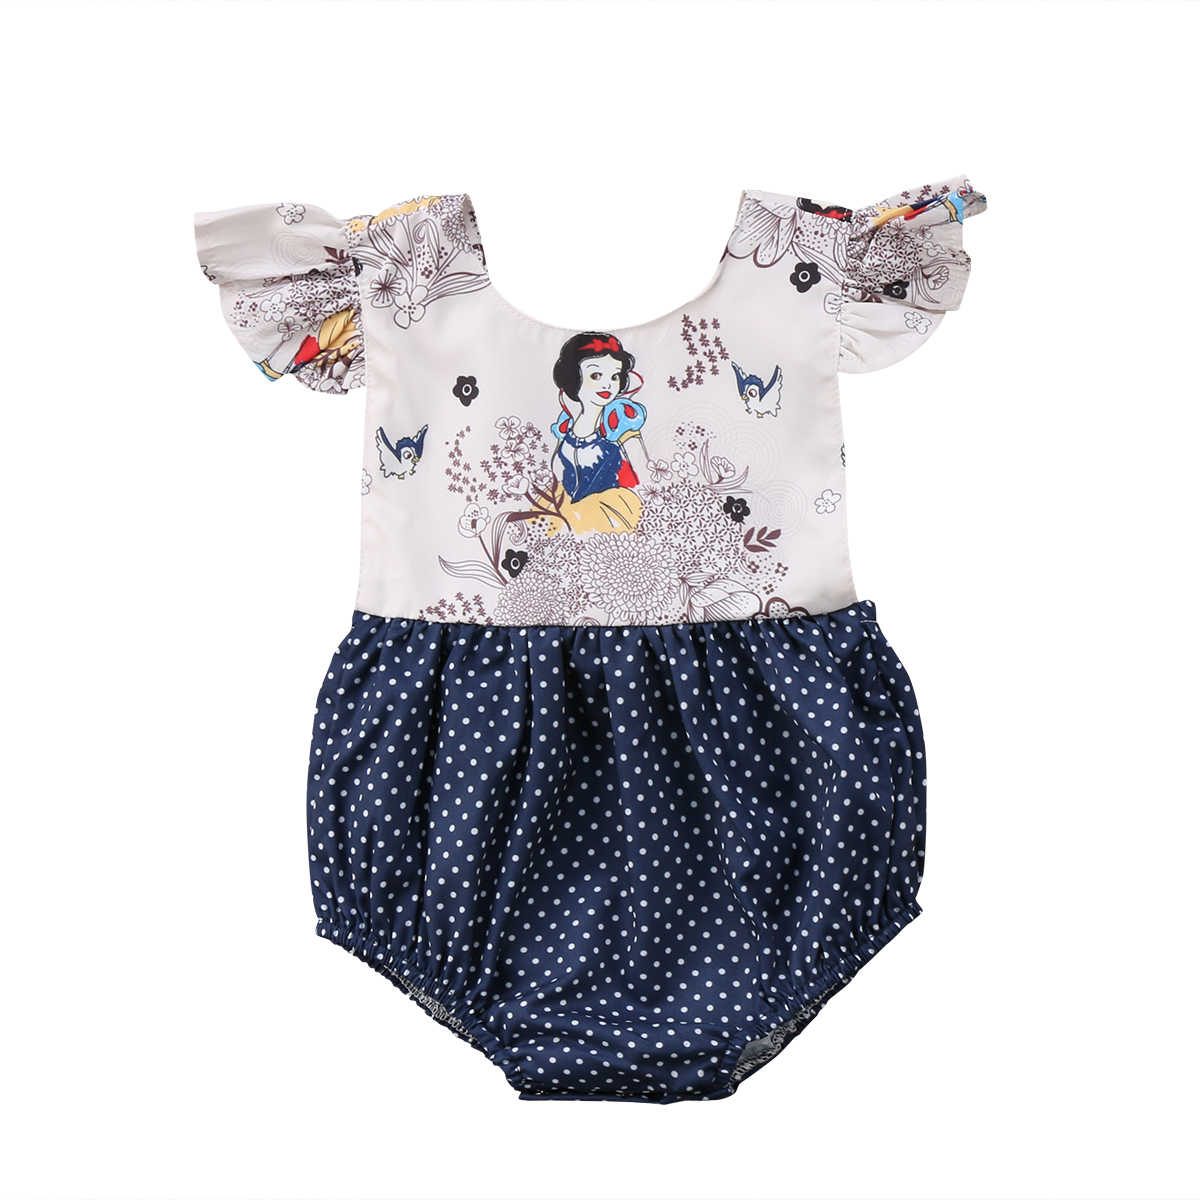 82622feb47b2 2018 Newborn Baby Girls Cartoon Flying Sleeves Polka Dot Jumpsuit Bodysuit  Navy Blue Summer Outfits Clothes